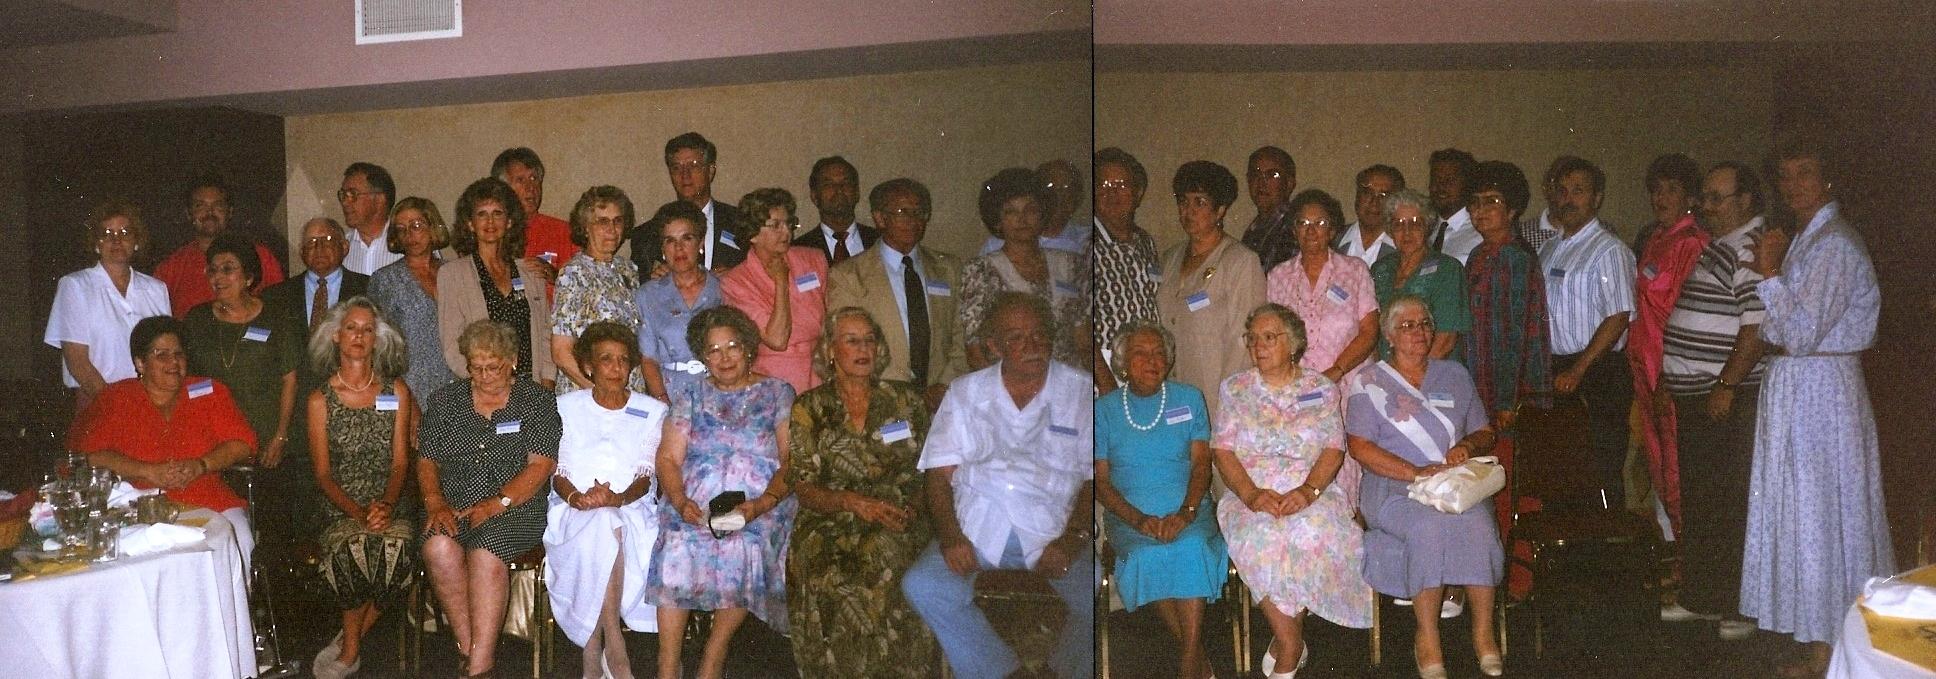 1995 Huntington, WV